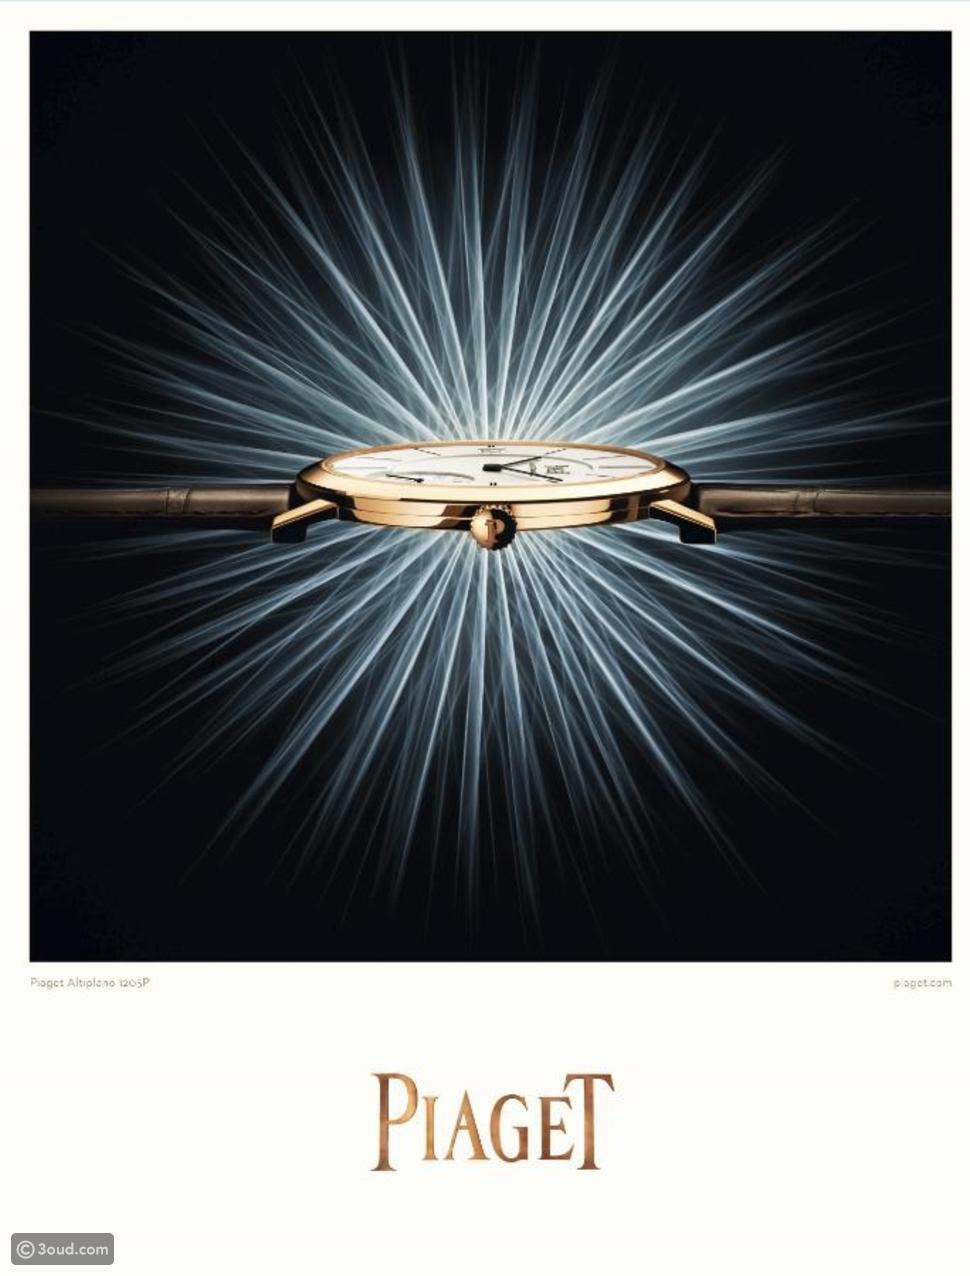 Piaget Ultimate Radiance